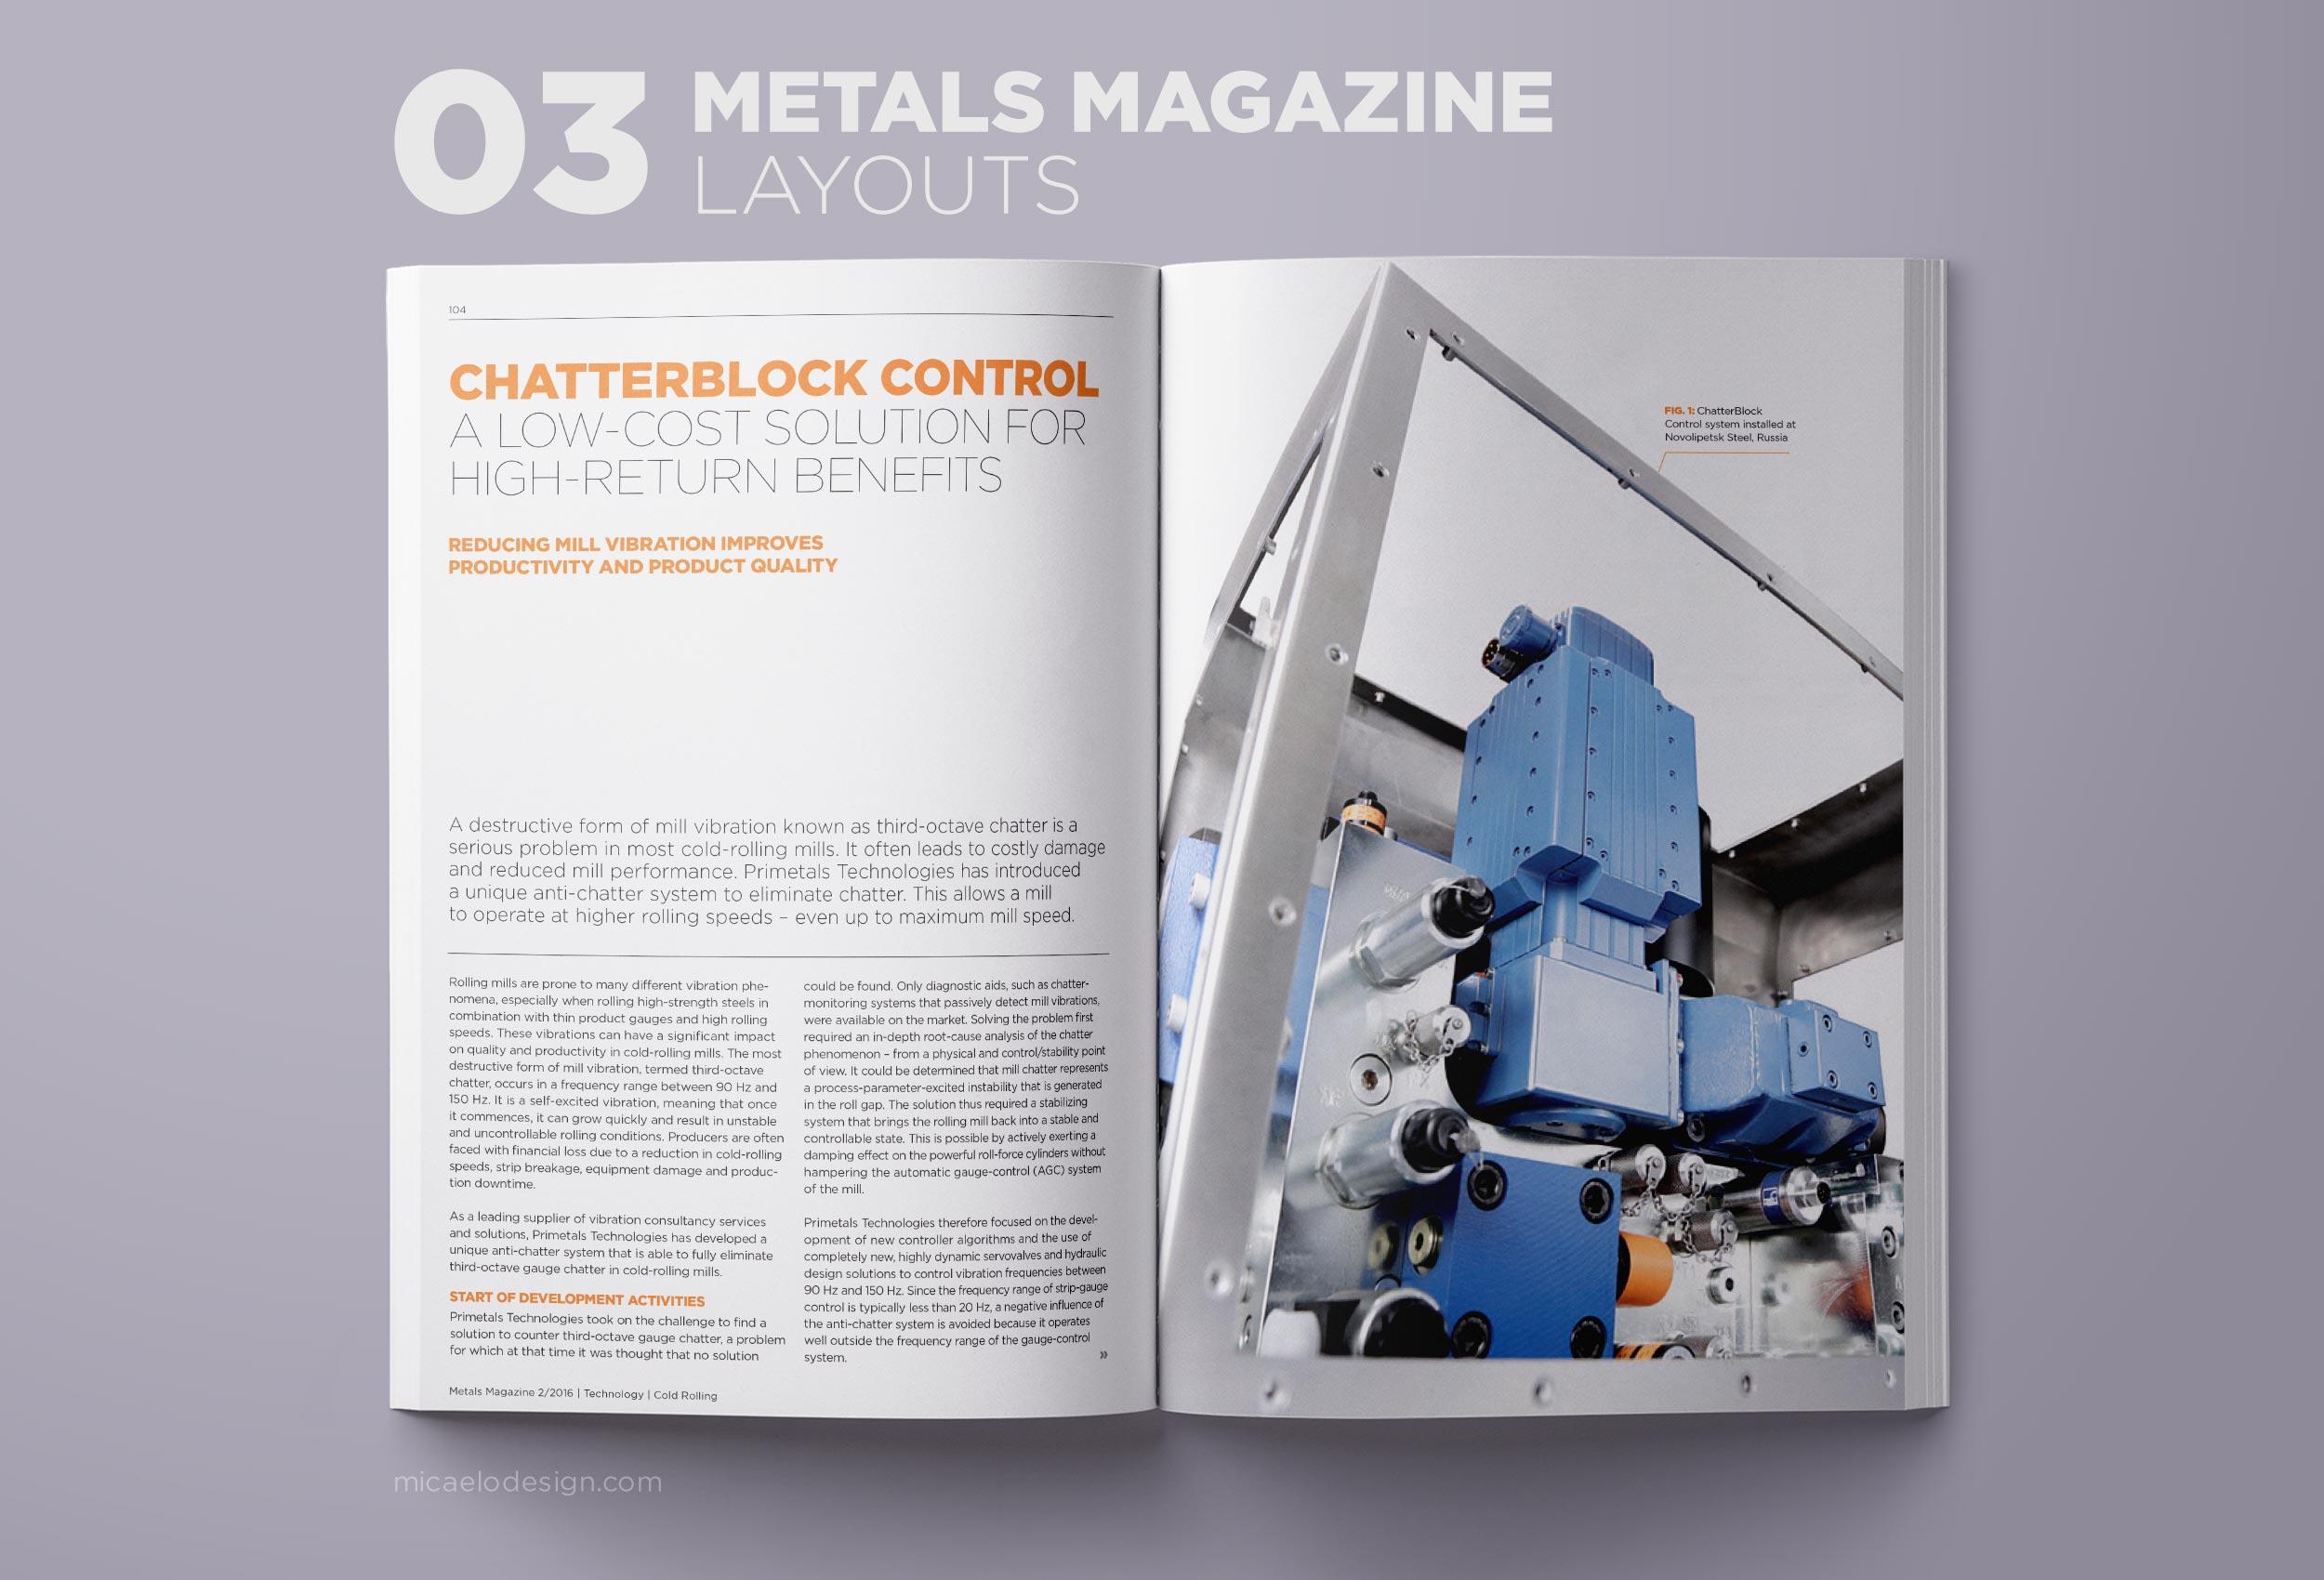 Primetals Metals Magazine layout N03